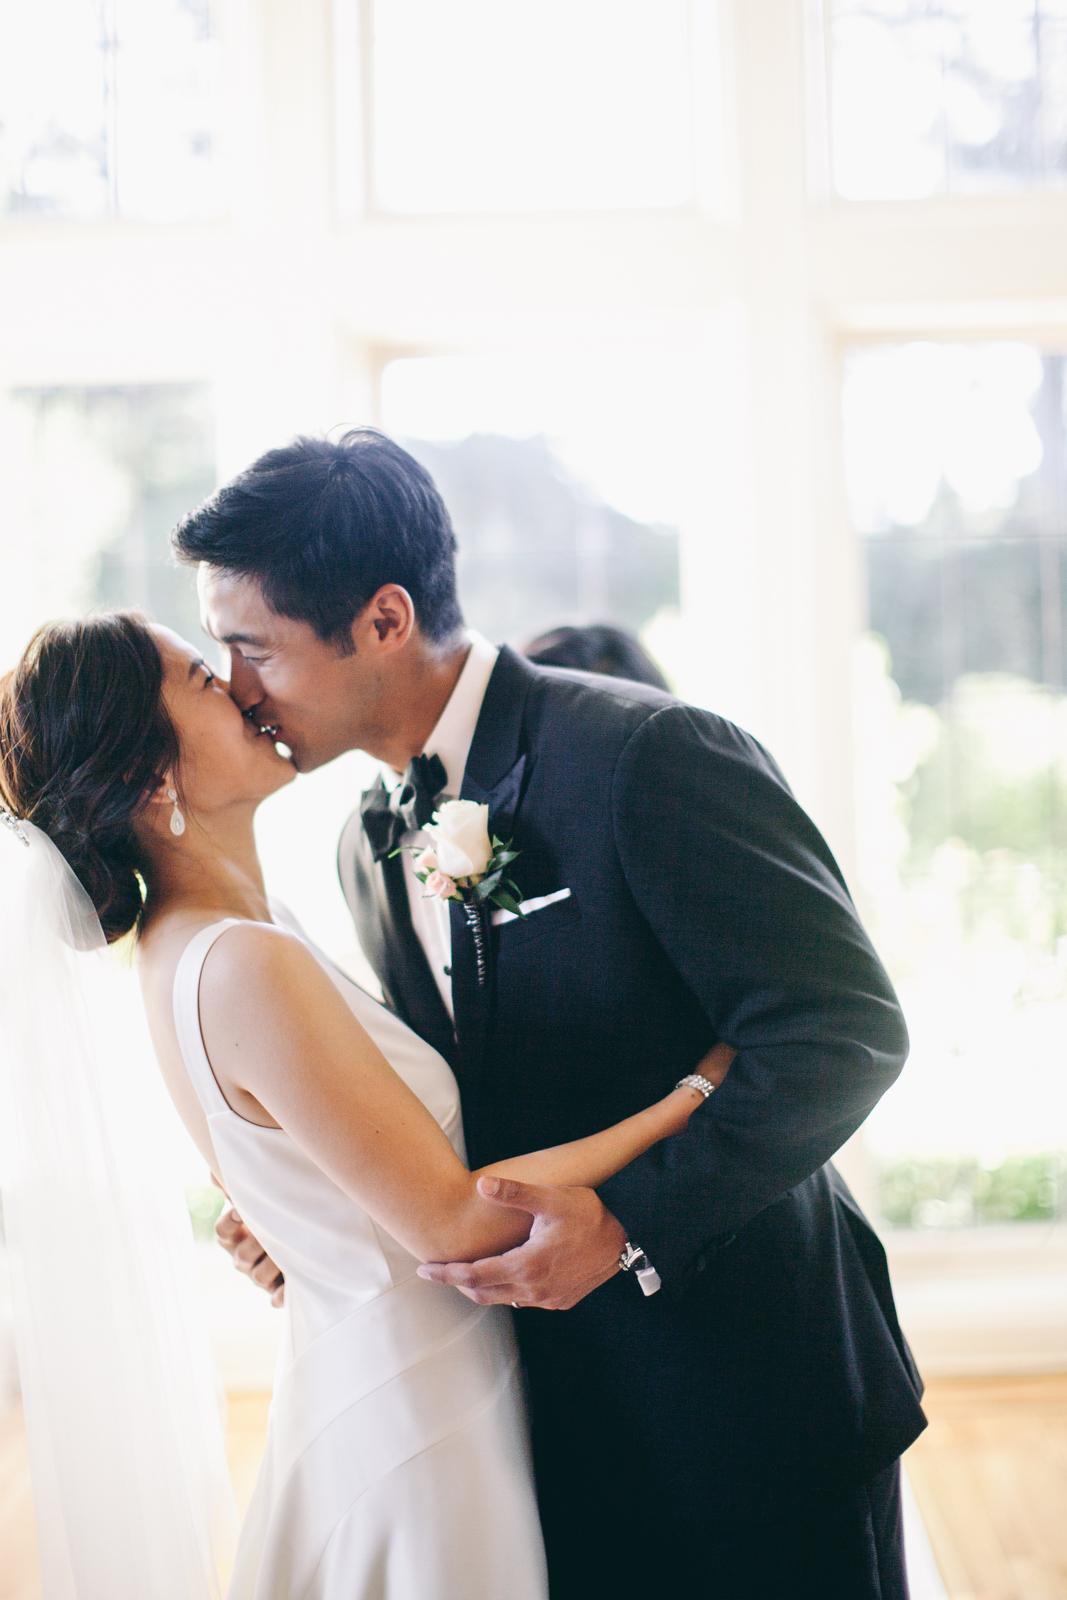 kohl_manison_wedding_photography_sarah_eric_ebony_siovhan_bokeh_photography_047.jpg